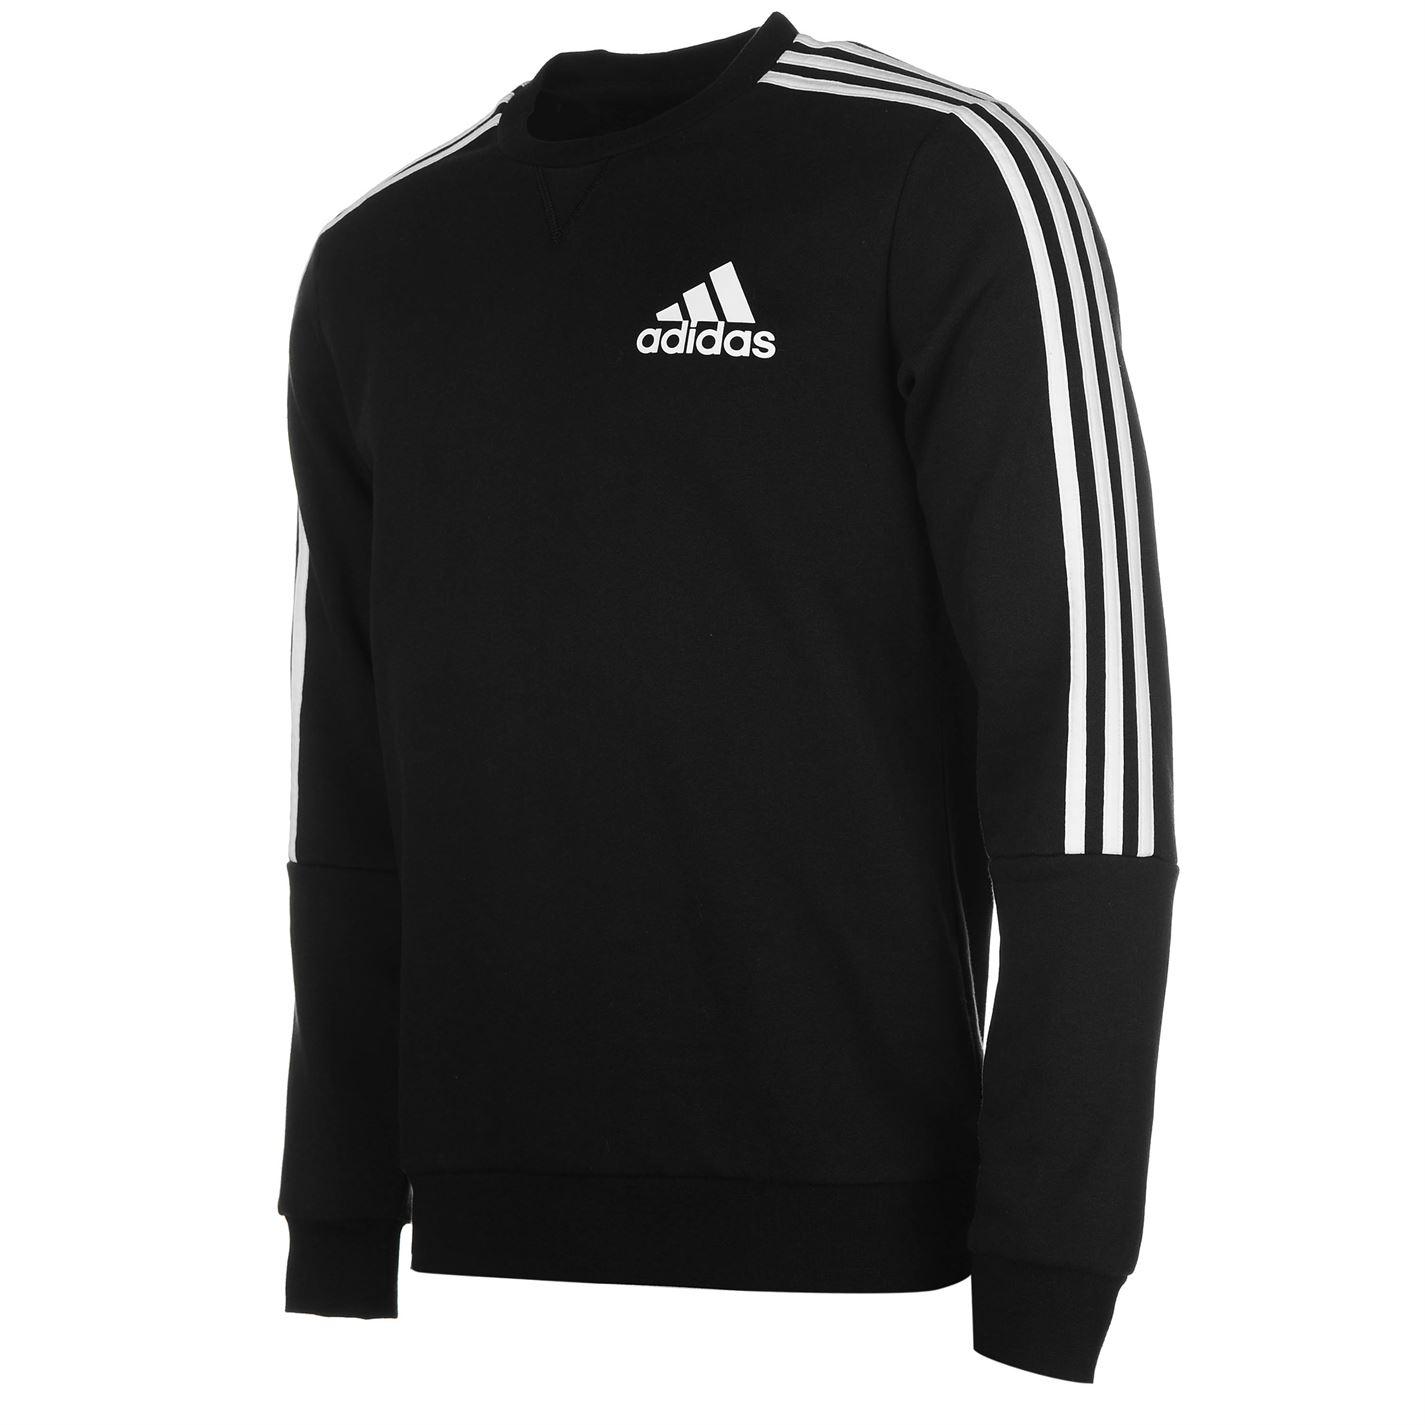 adidas 3 Stripes Crew Sweatshirt pánské